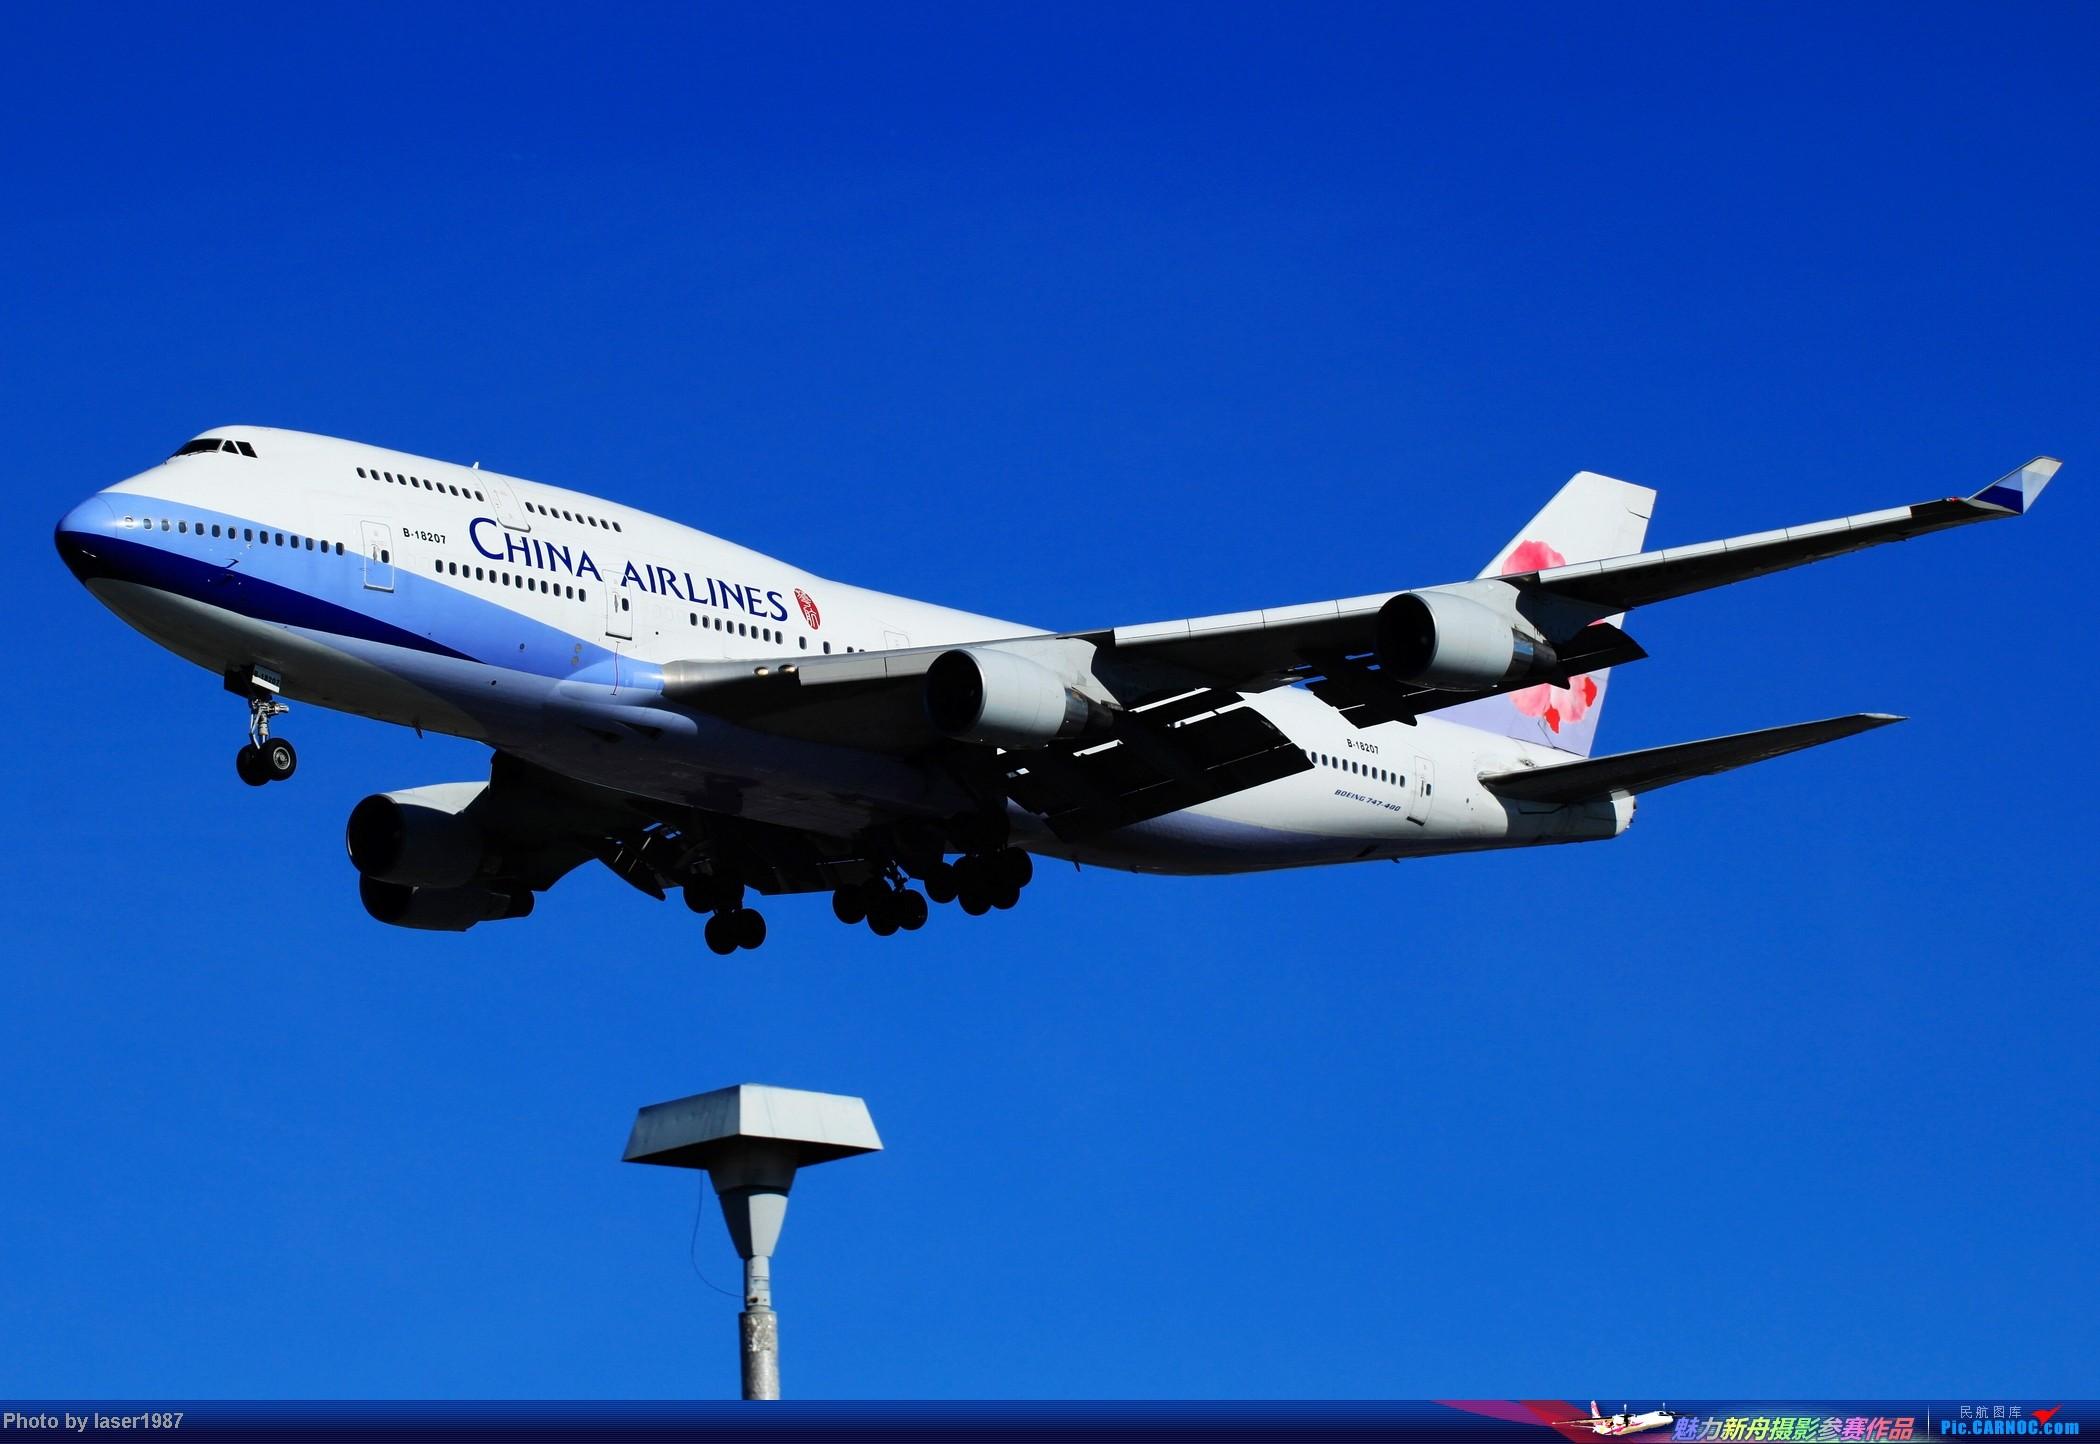 Re:[原创]2011.12.25 LAX 24R跑道东侧停车场拍飞机 BOEING 747-400 B-18207 美国洛杉矶国际机场